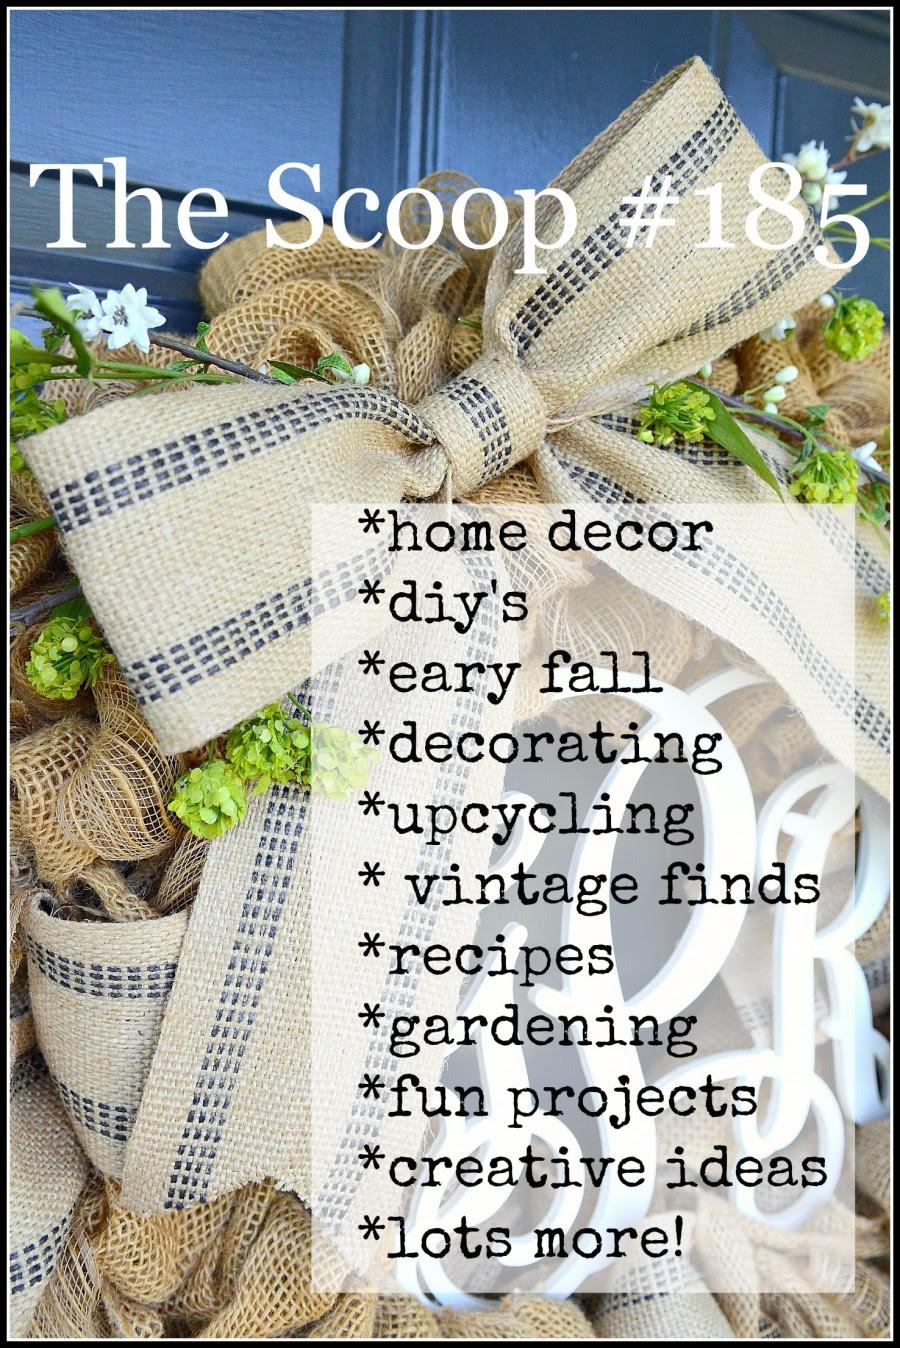 THE SCOOP- Hundreds of creative home and garden ideas. Lots of inspiration-stonegableblog.com